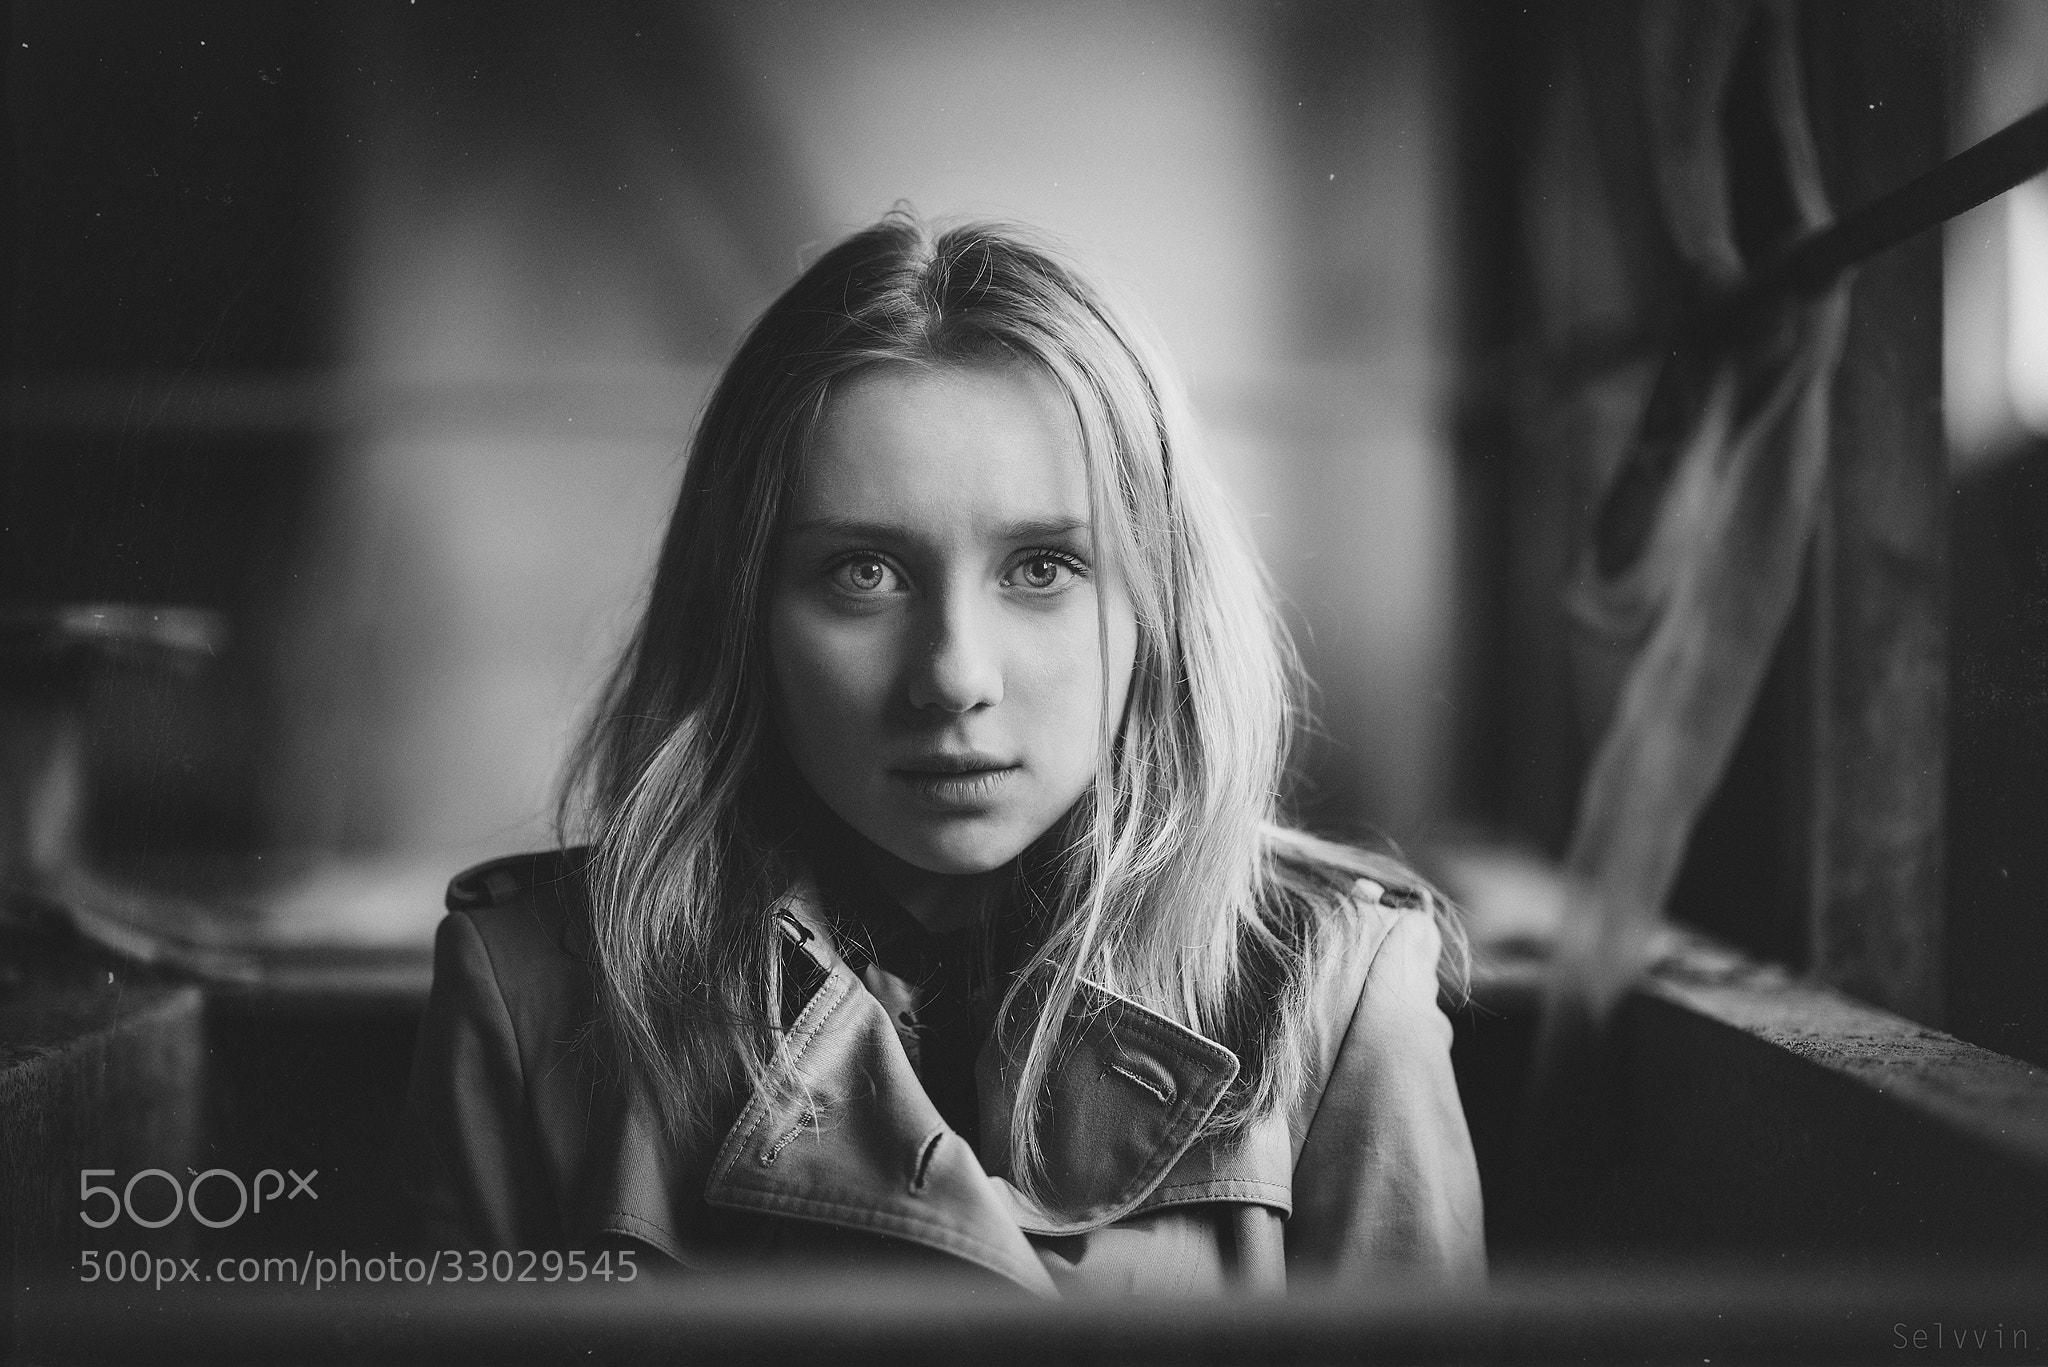 Photograph *-* by Vladislav Selvvin on 500px